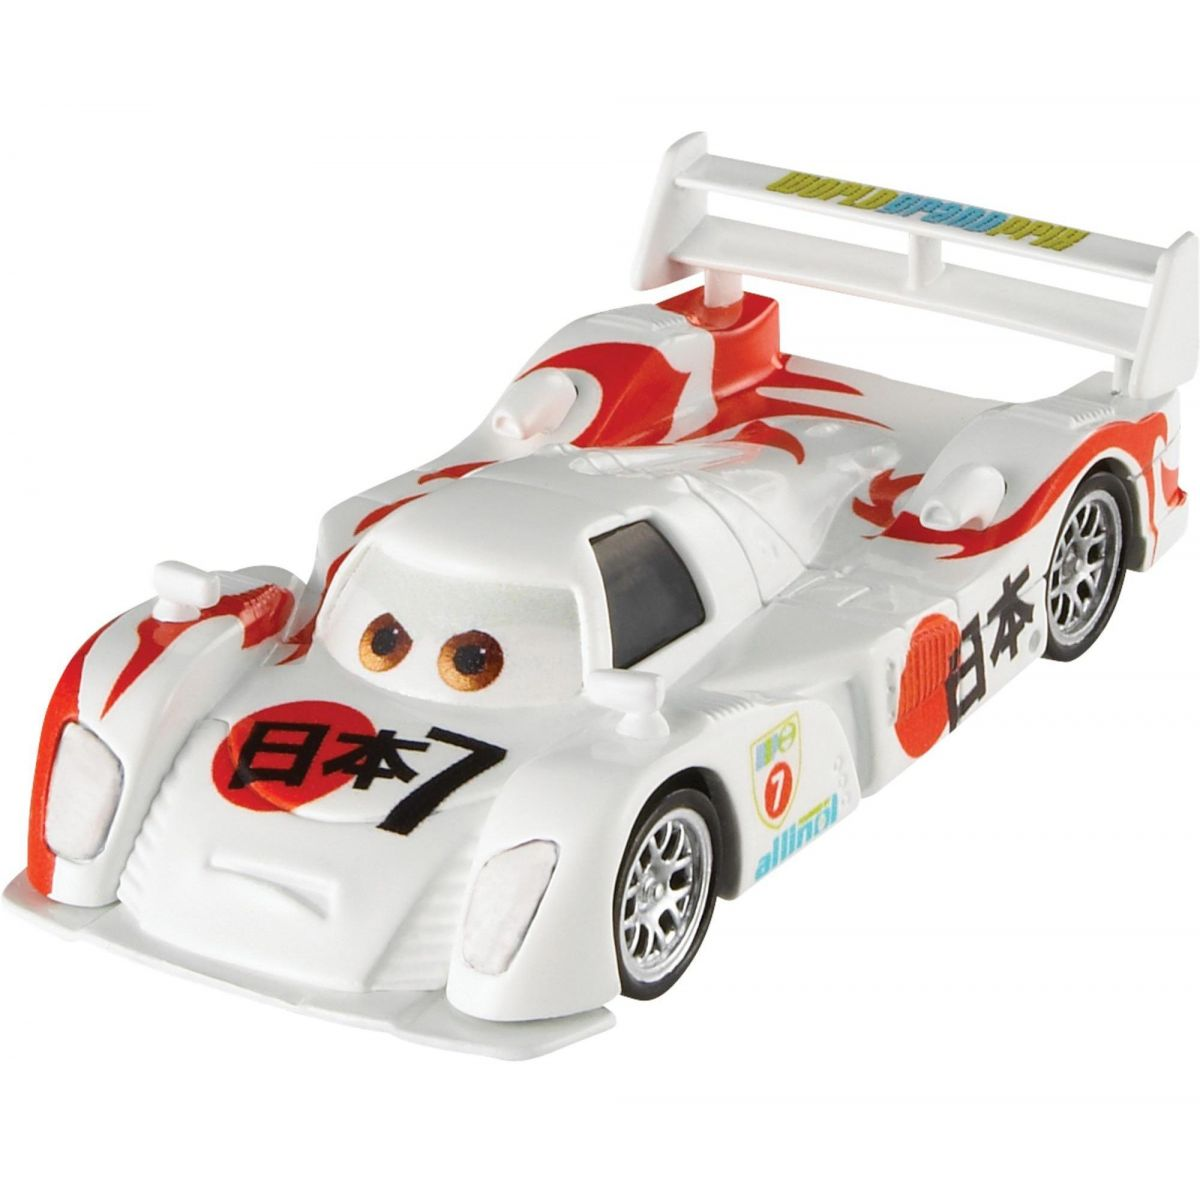 Mattel Cars 3 Auta Shu Todoroki